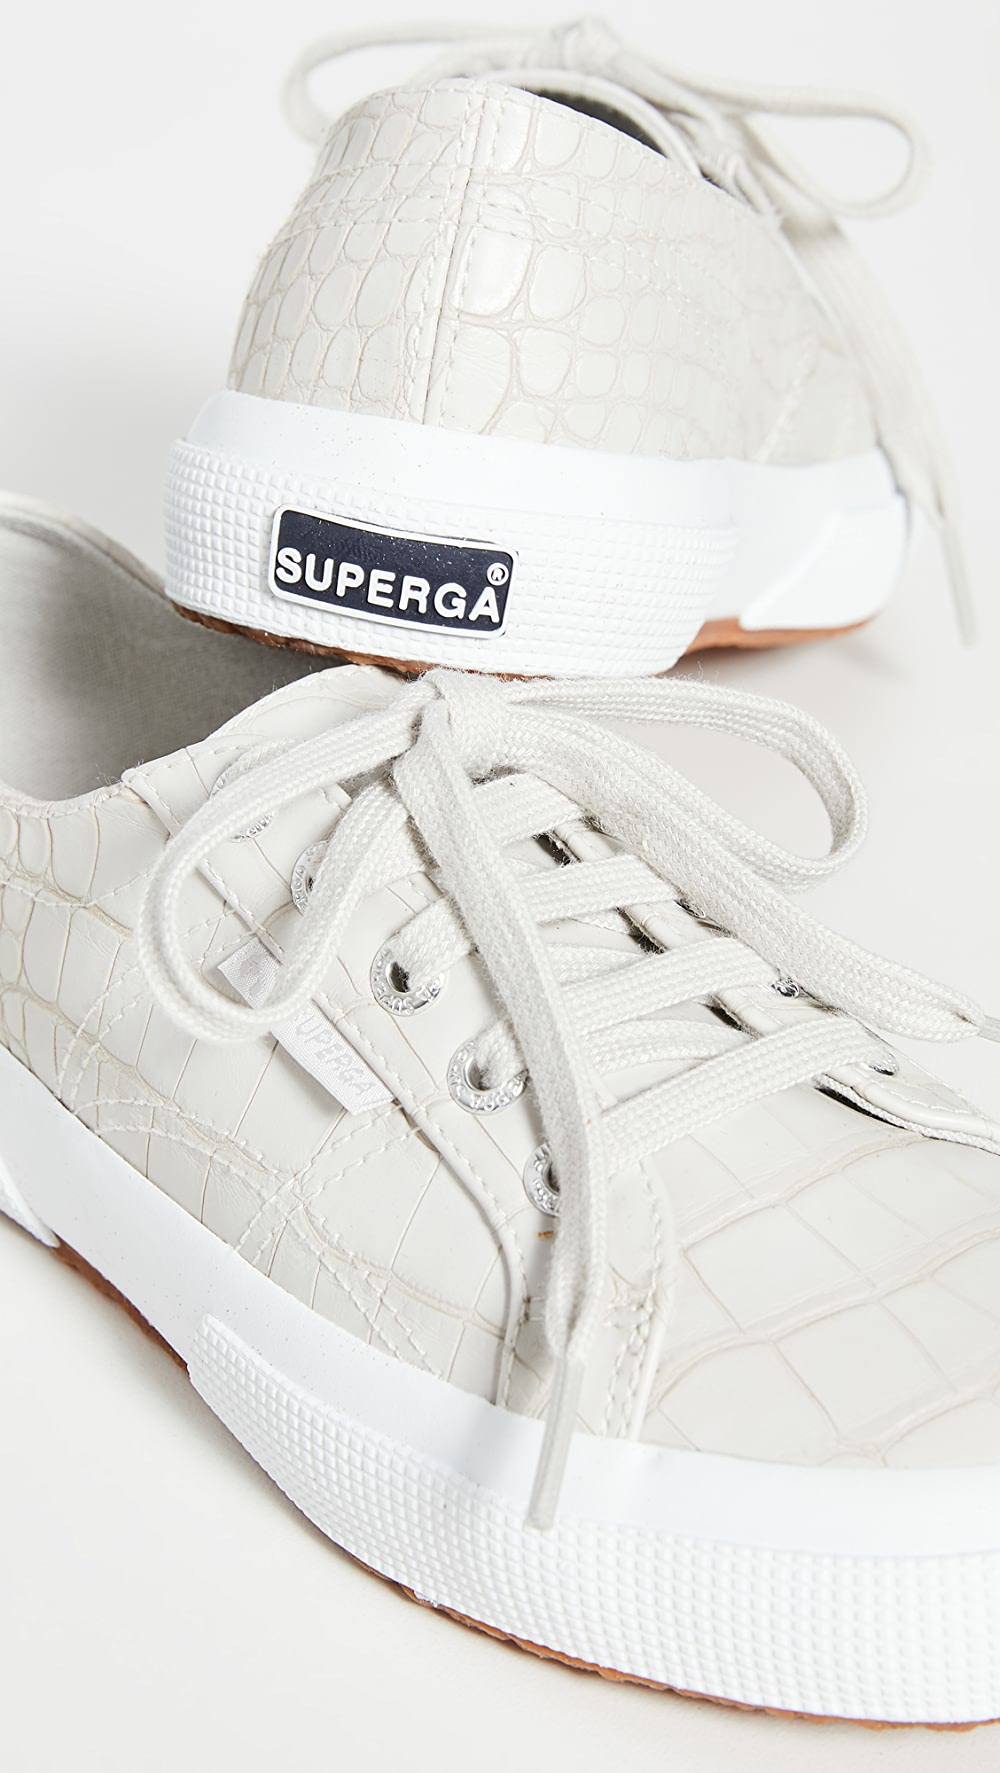 Adaptable Superga - 2750 Croc W Sneakers Elegant In Style